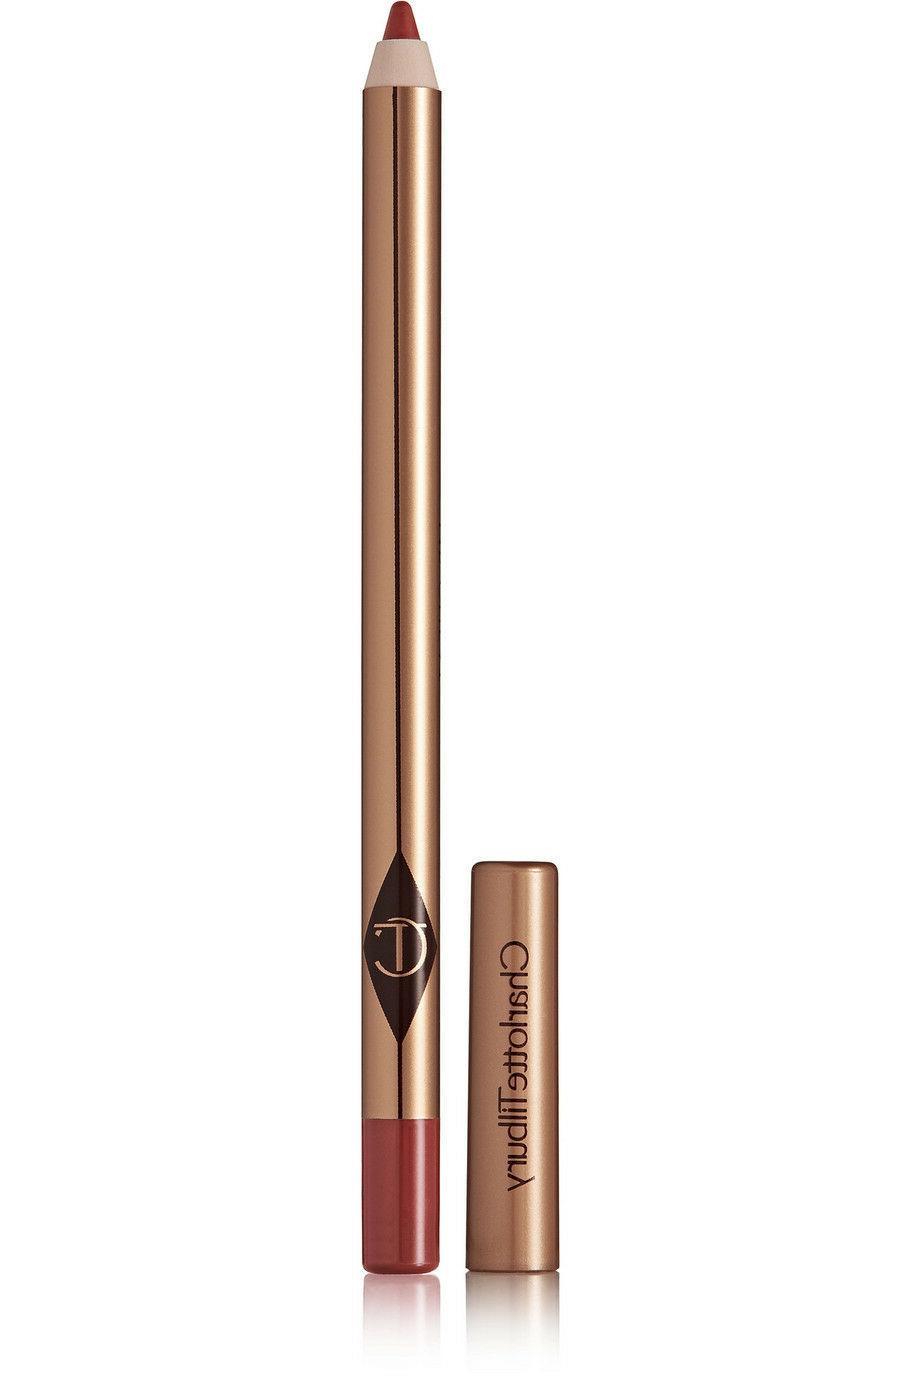 Authentic CHARLOTTE TILBURY Matte Revolution Lipstick in